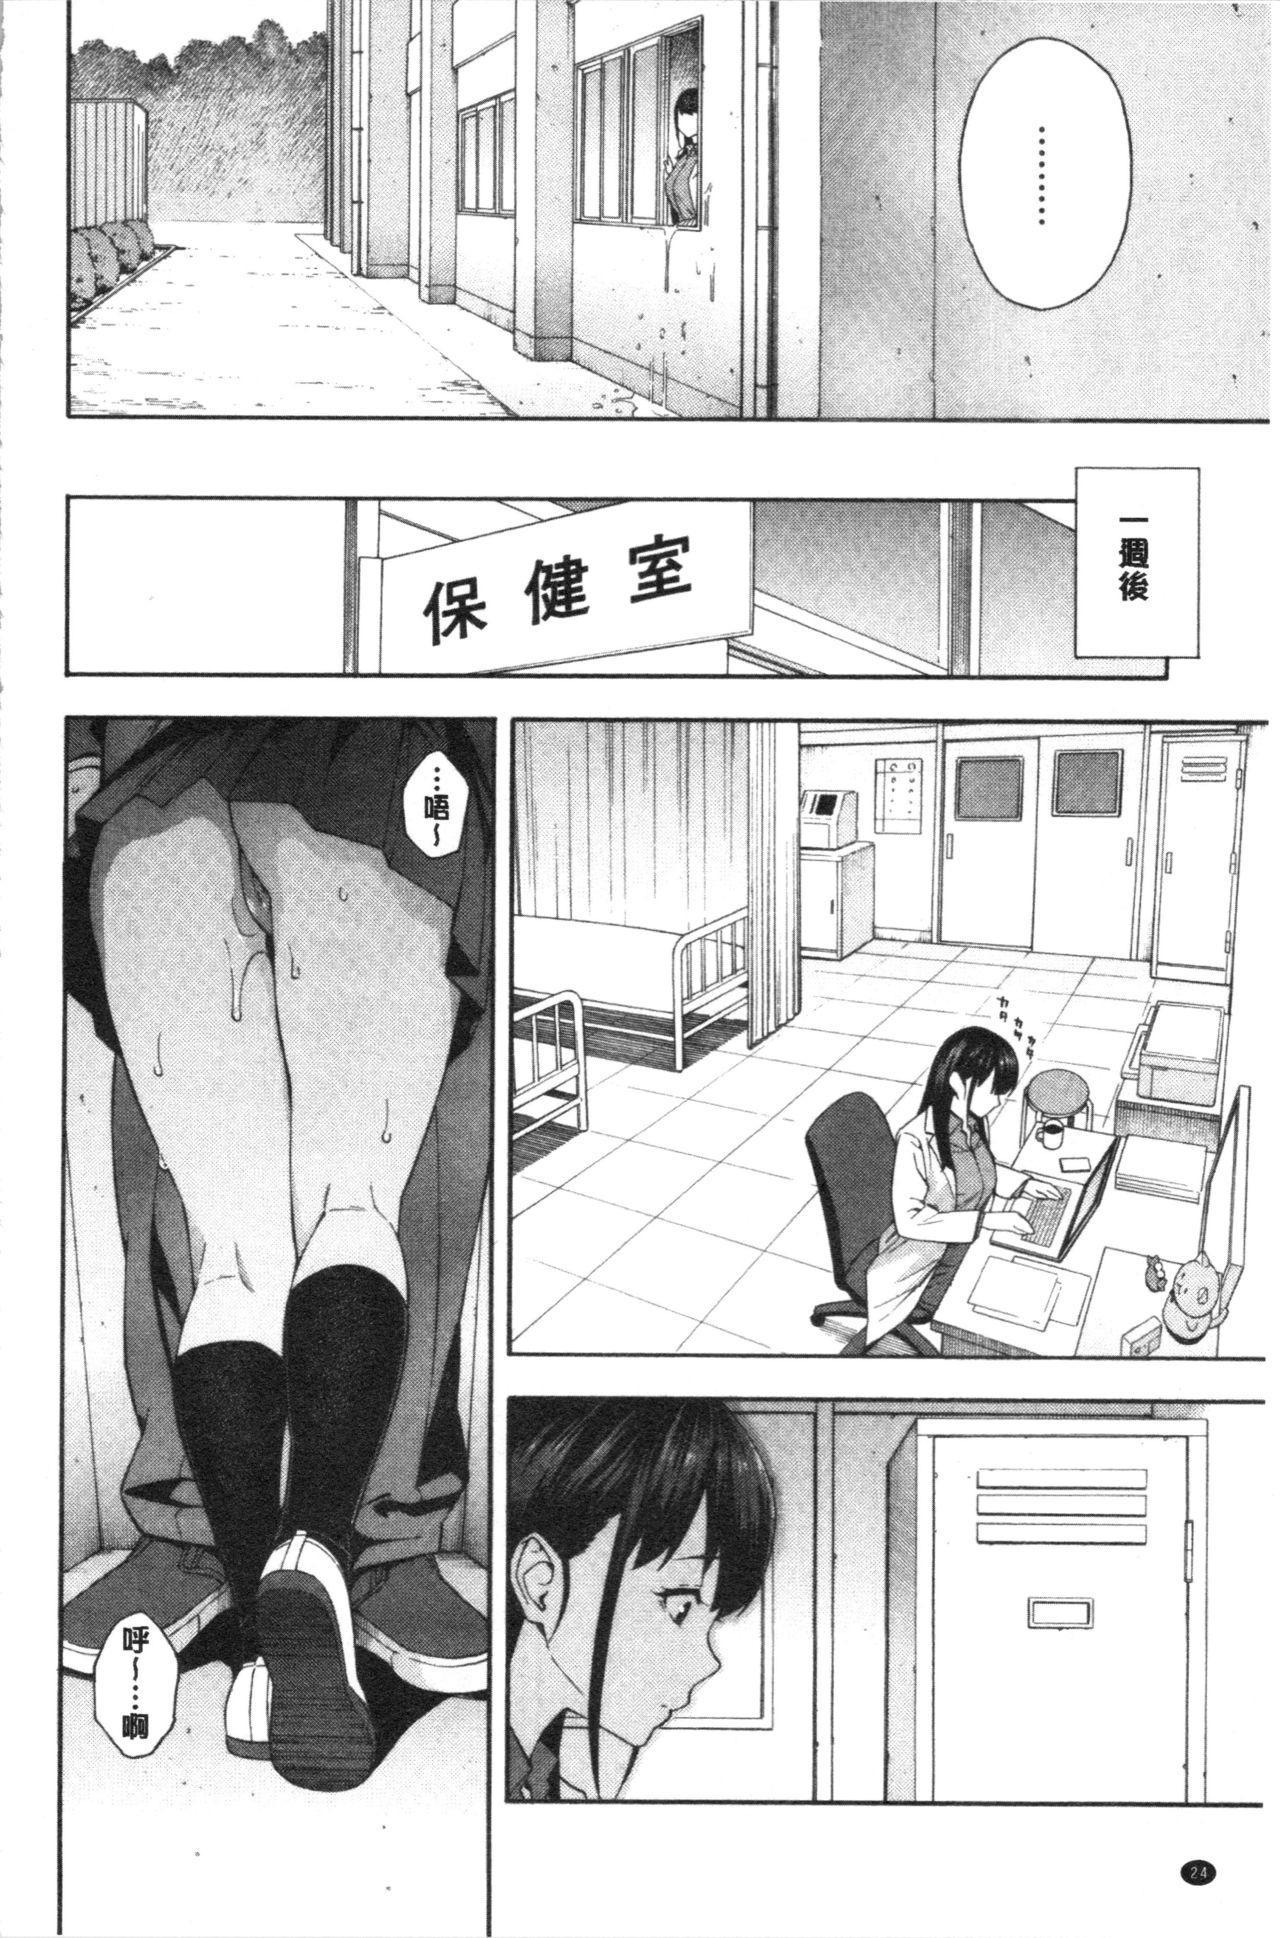 Okashite Ageru | 讓你來侵犯我 26